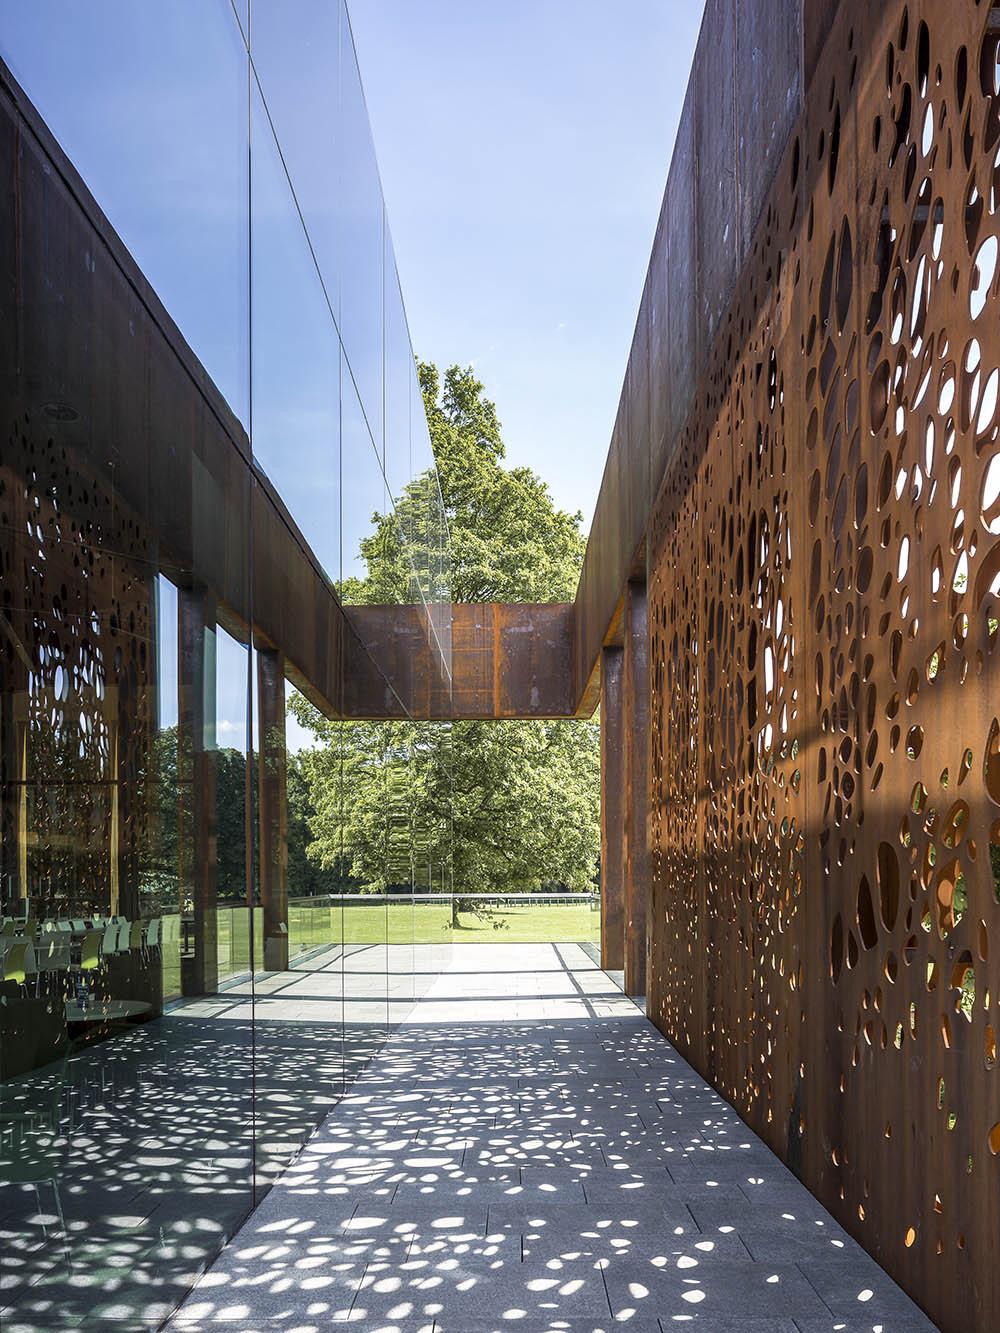 Image Credit: Design Engine Architects, https://www.designengine.co.uk/projects/john-henry-brookes-oxford-brookes-university/